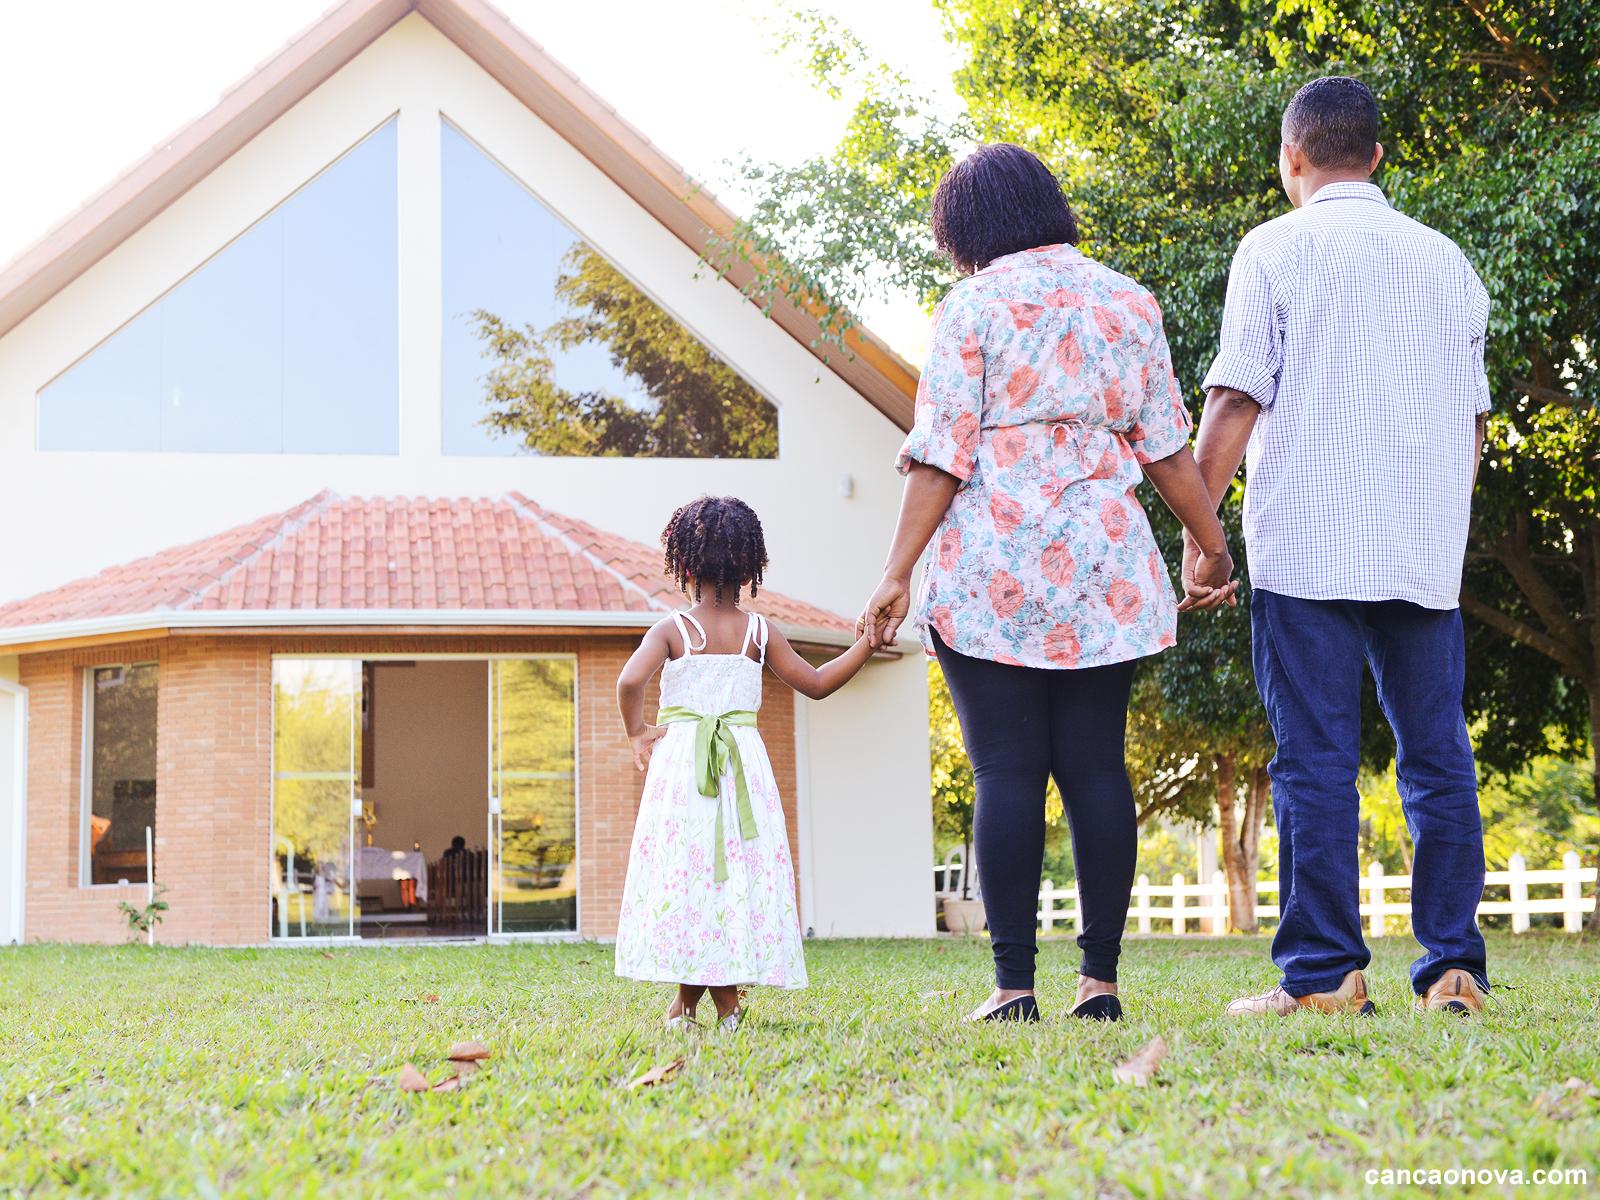 Conheça a importância de a criança estar inserida na Igreja - 1600x1200